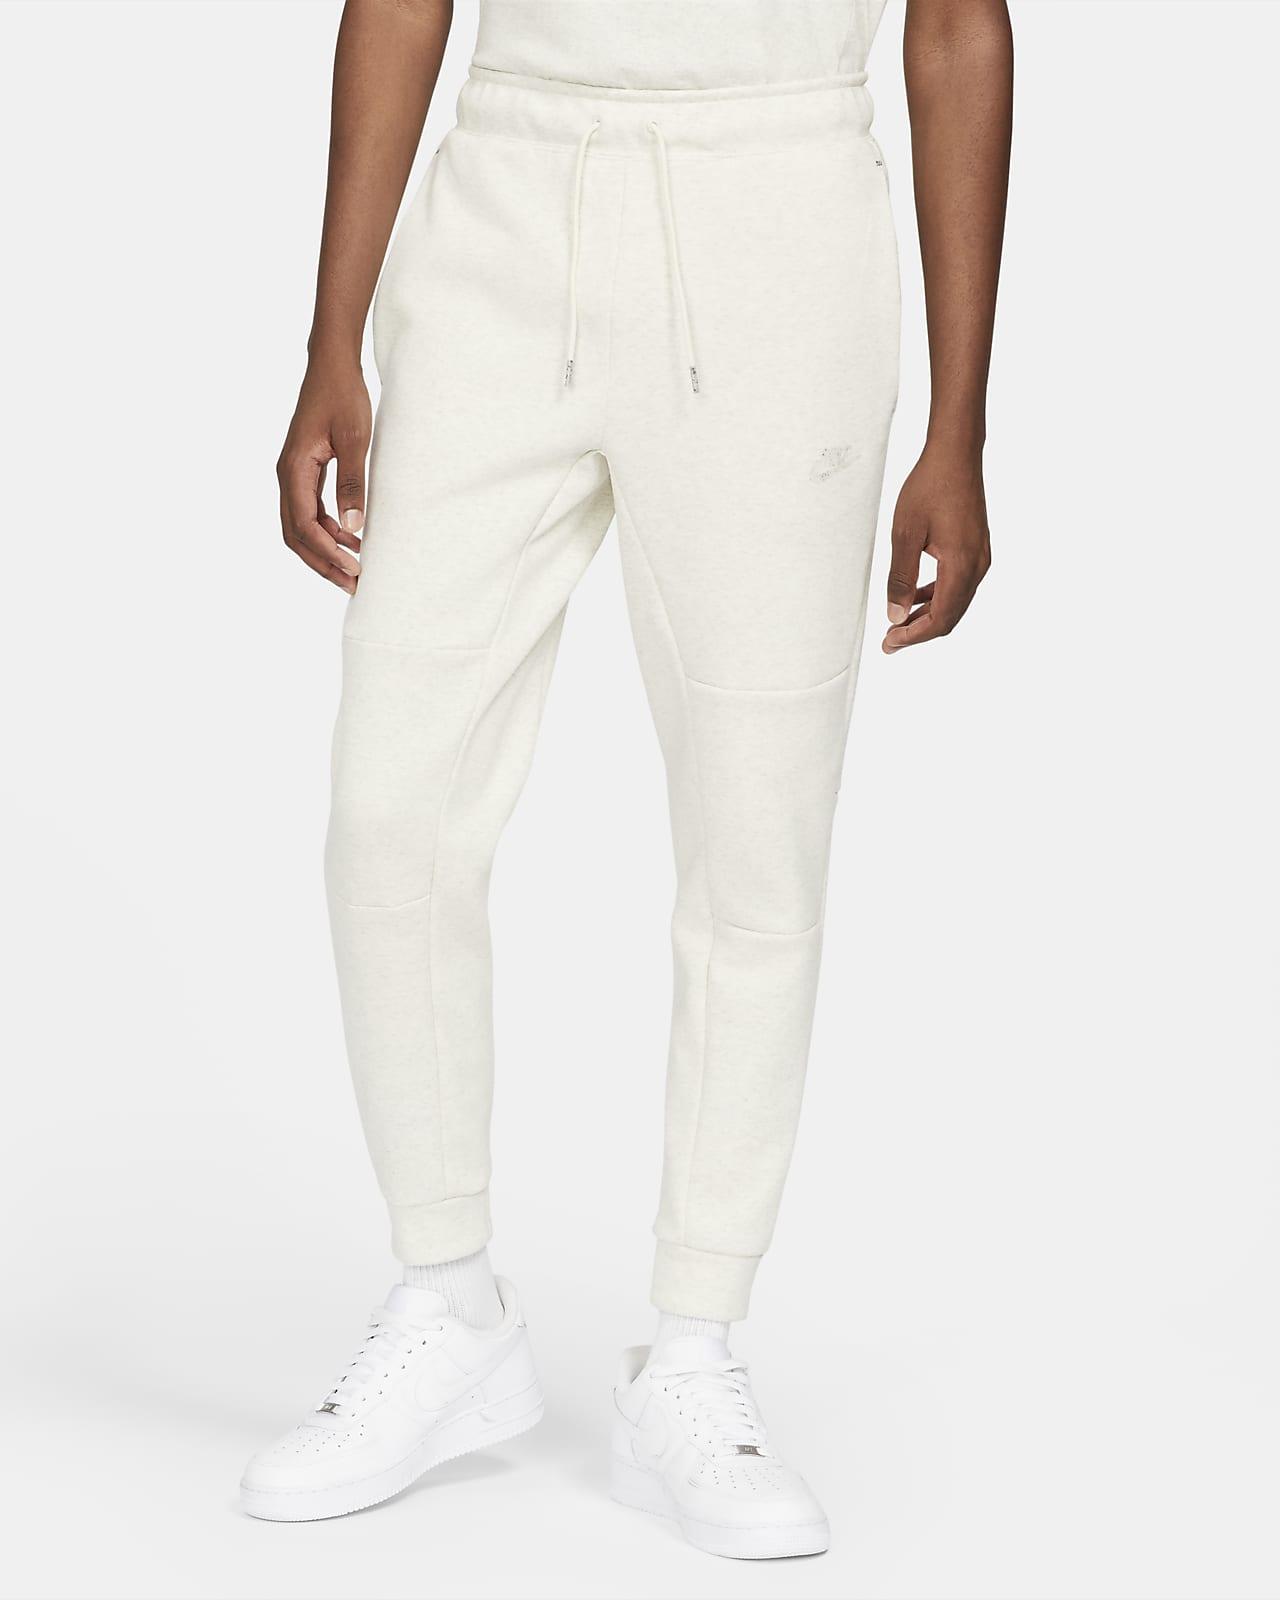 Pánské kalhoty Nike Sportswear Tech Fleece